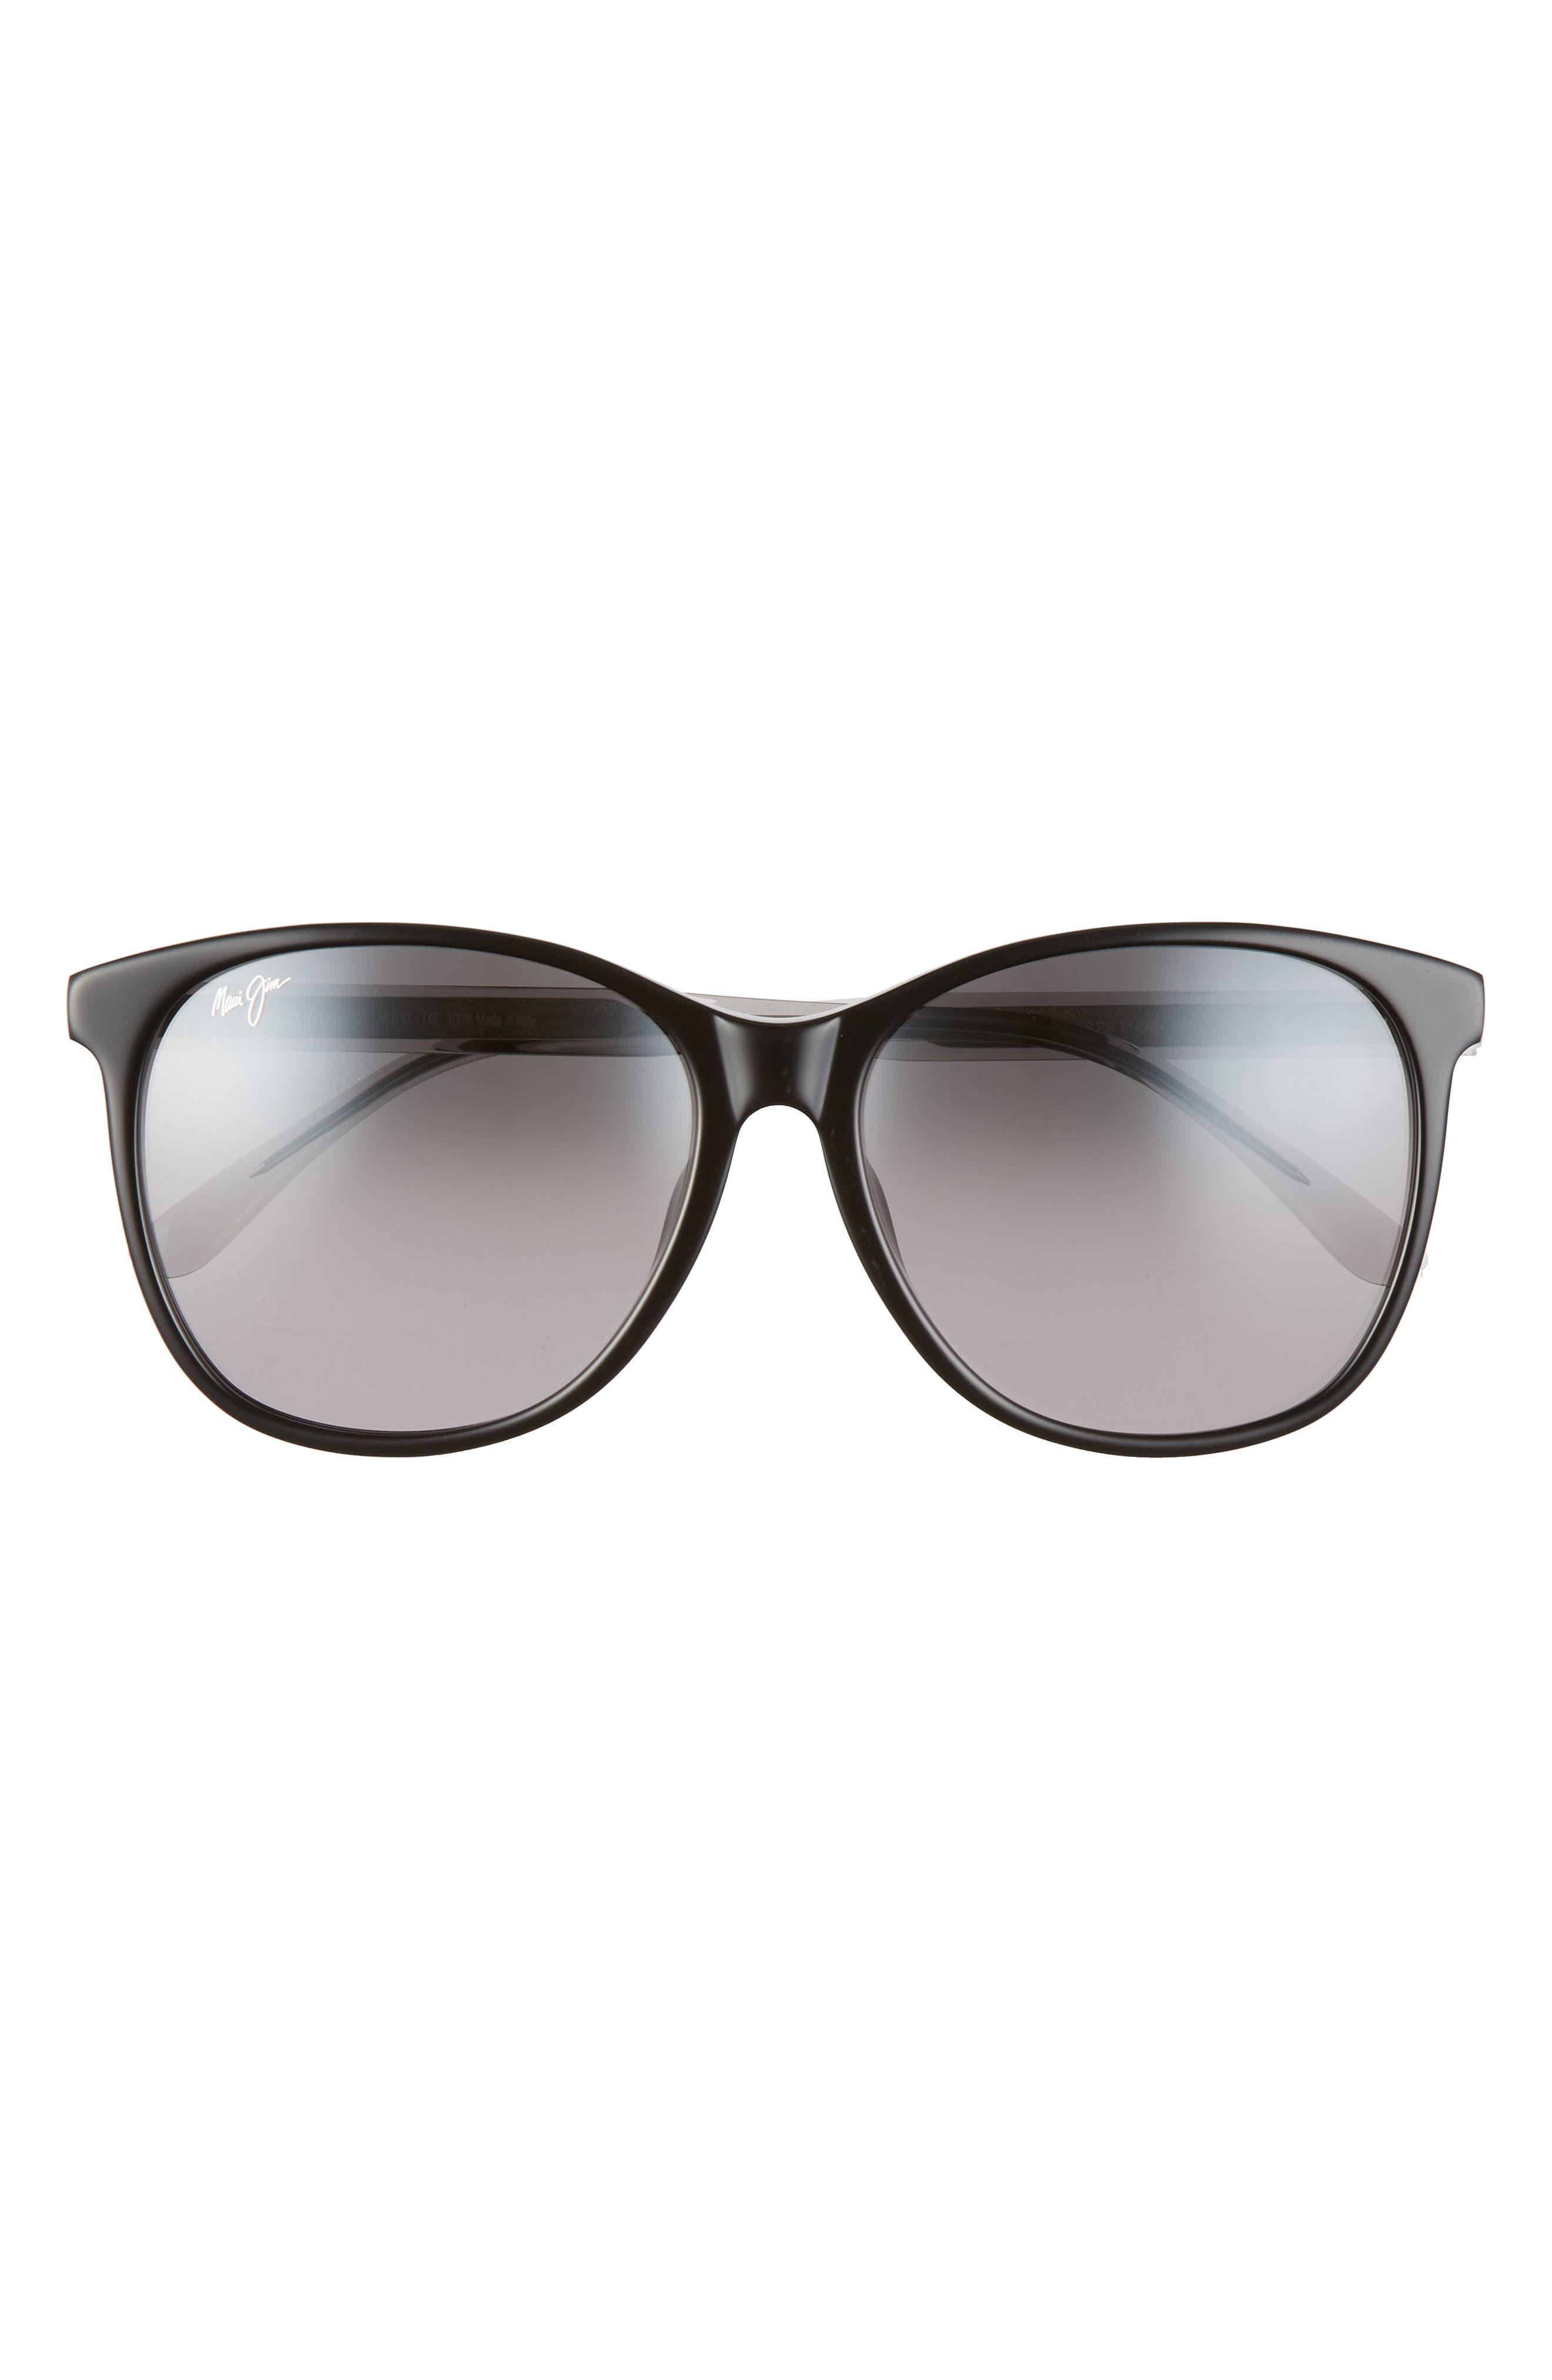 Maui Jim Womens Cathedrals Square Sunglasses